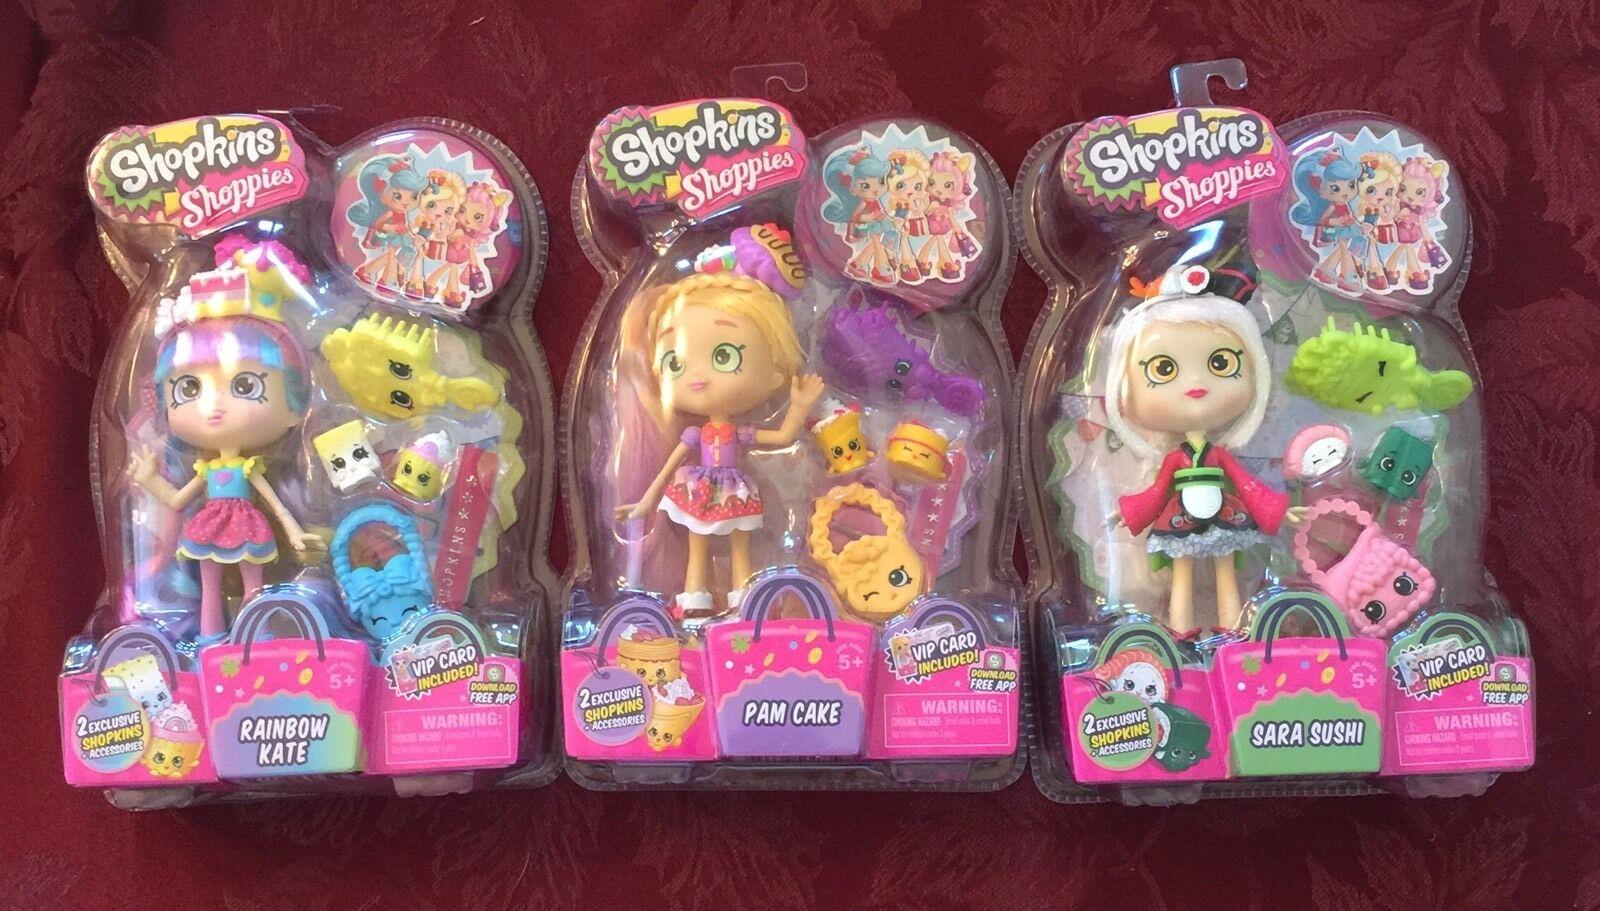 SHOPKINS SEASON 1 Shoppies Pam Cake, Sara Sushi, Rainbow Kate...NOT IN STORES